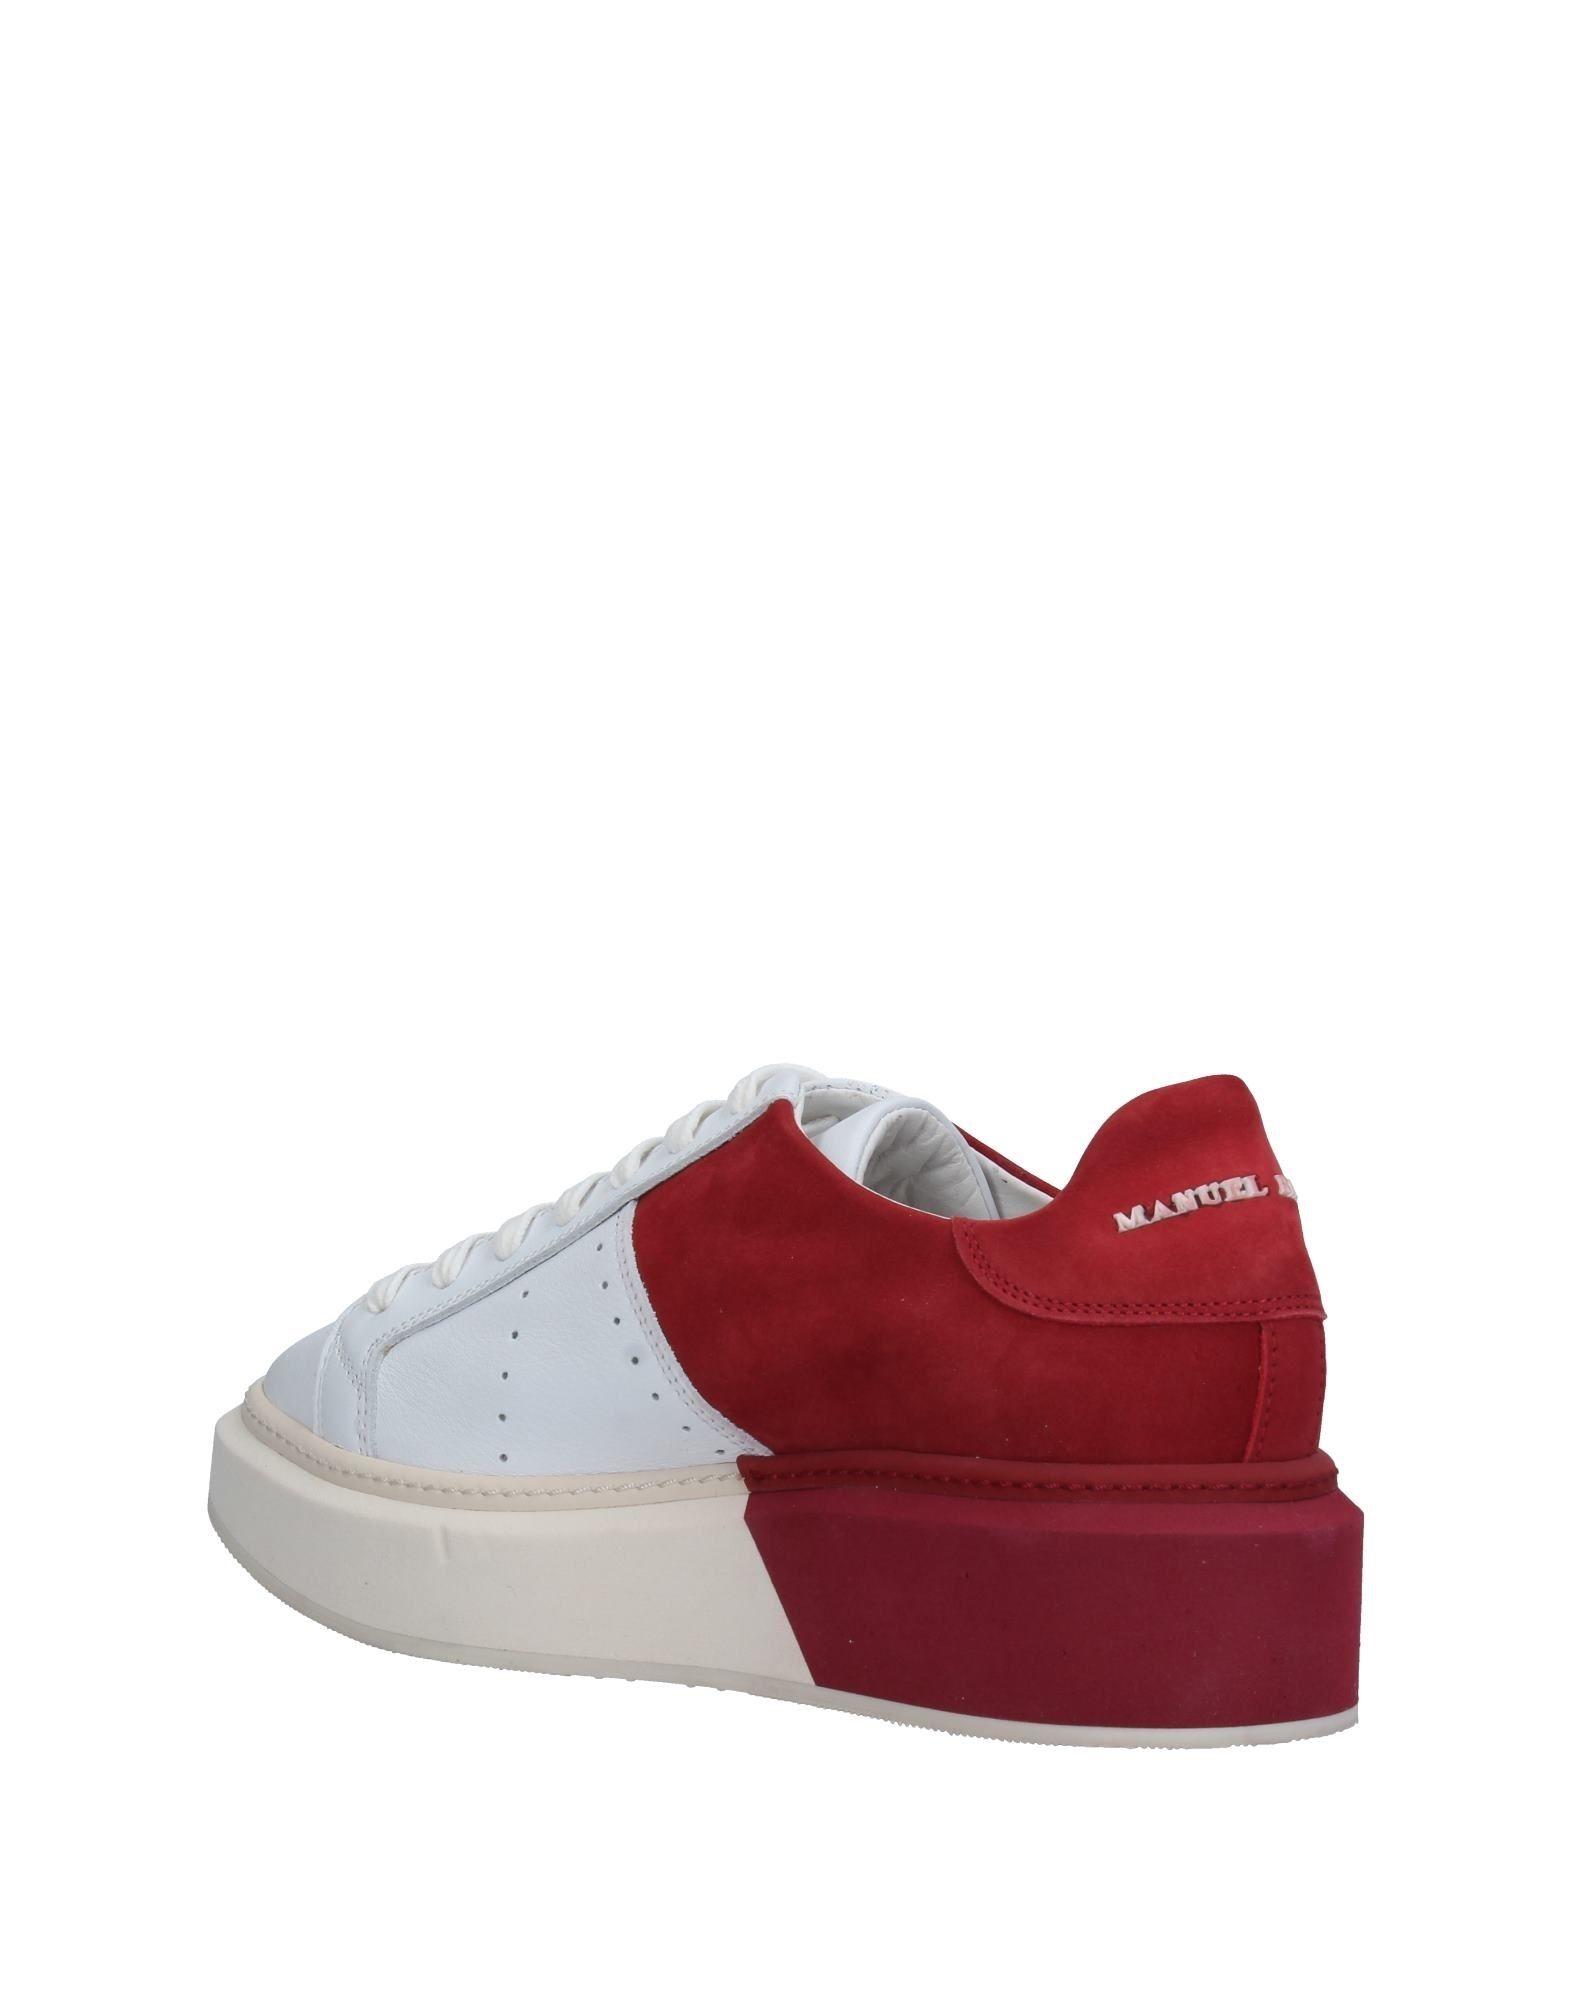 Manuel Barceló Sneakers Damen  11332260KV Gute Qualität beliebte Schuhe